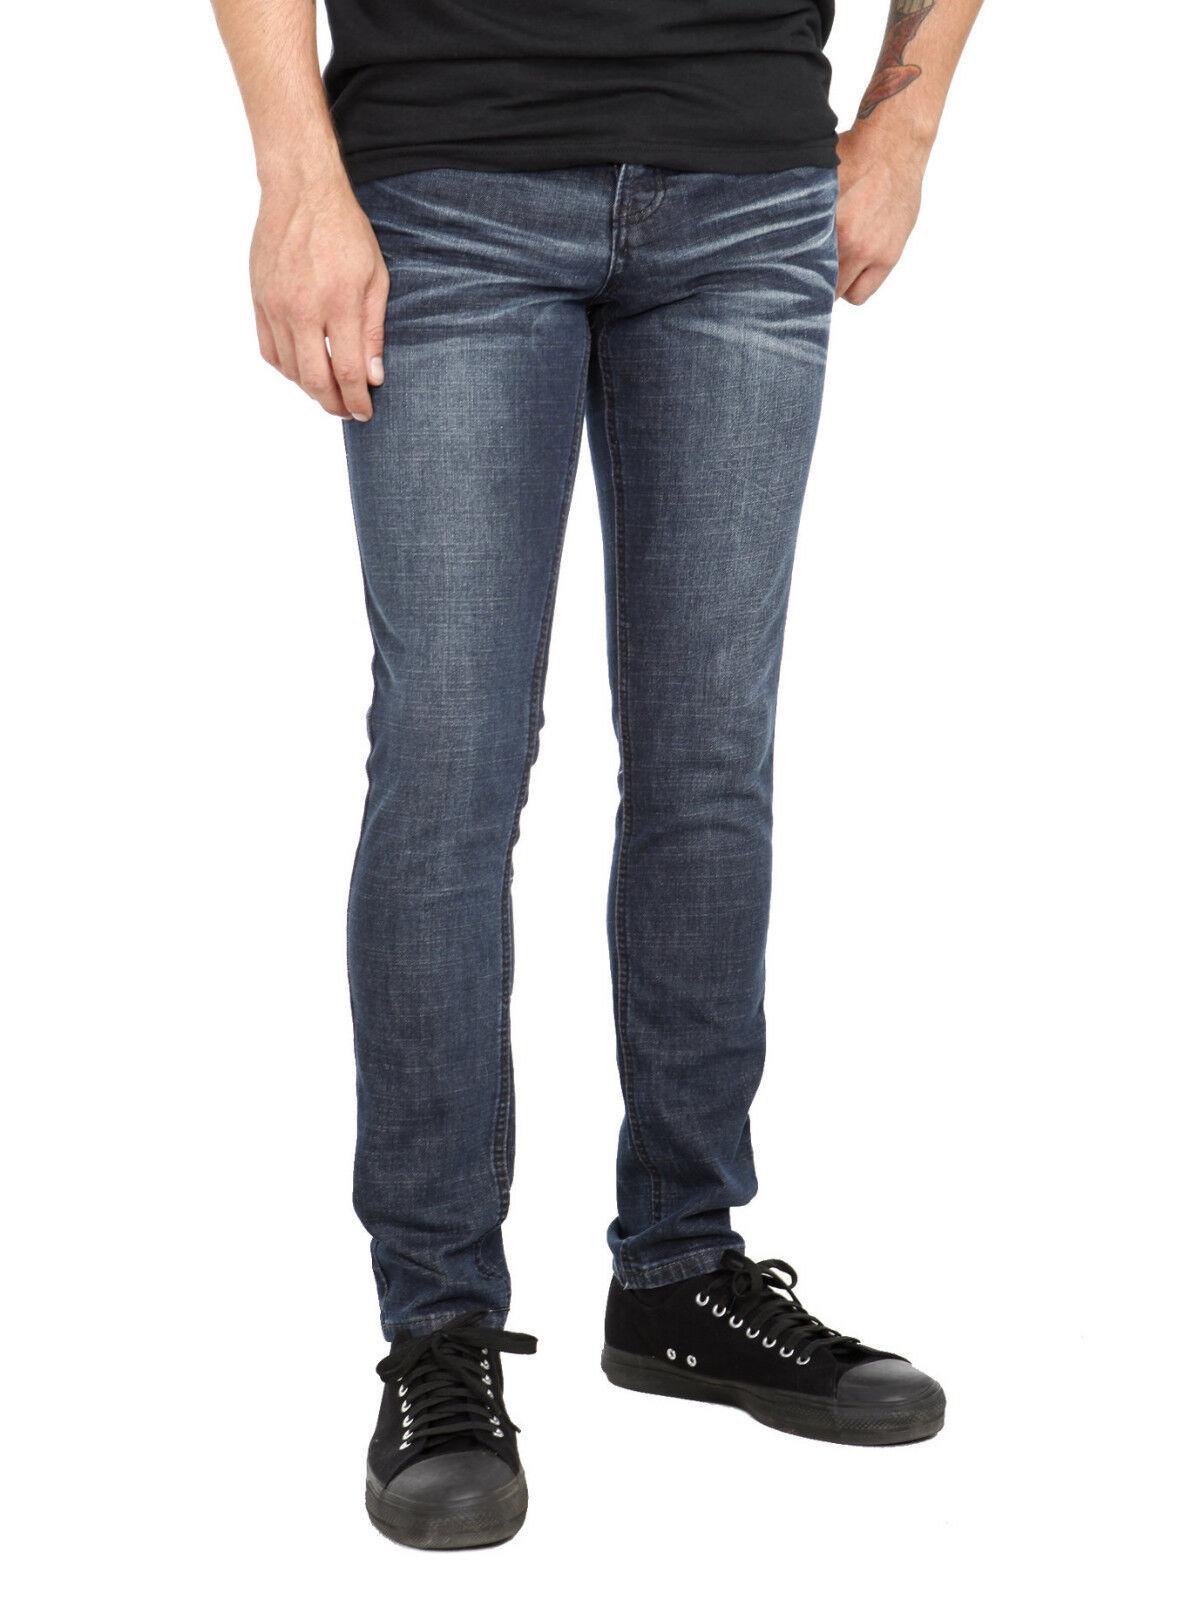 XXX RUDE Dark Vintage Wash Skinny bluee Jeans Pants Mens 36  Waist 32  Inseam NWT